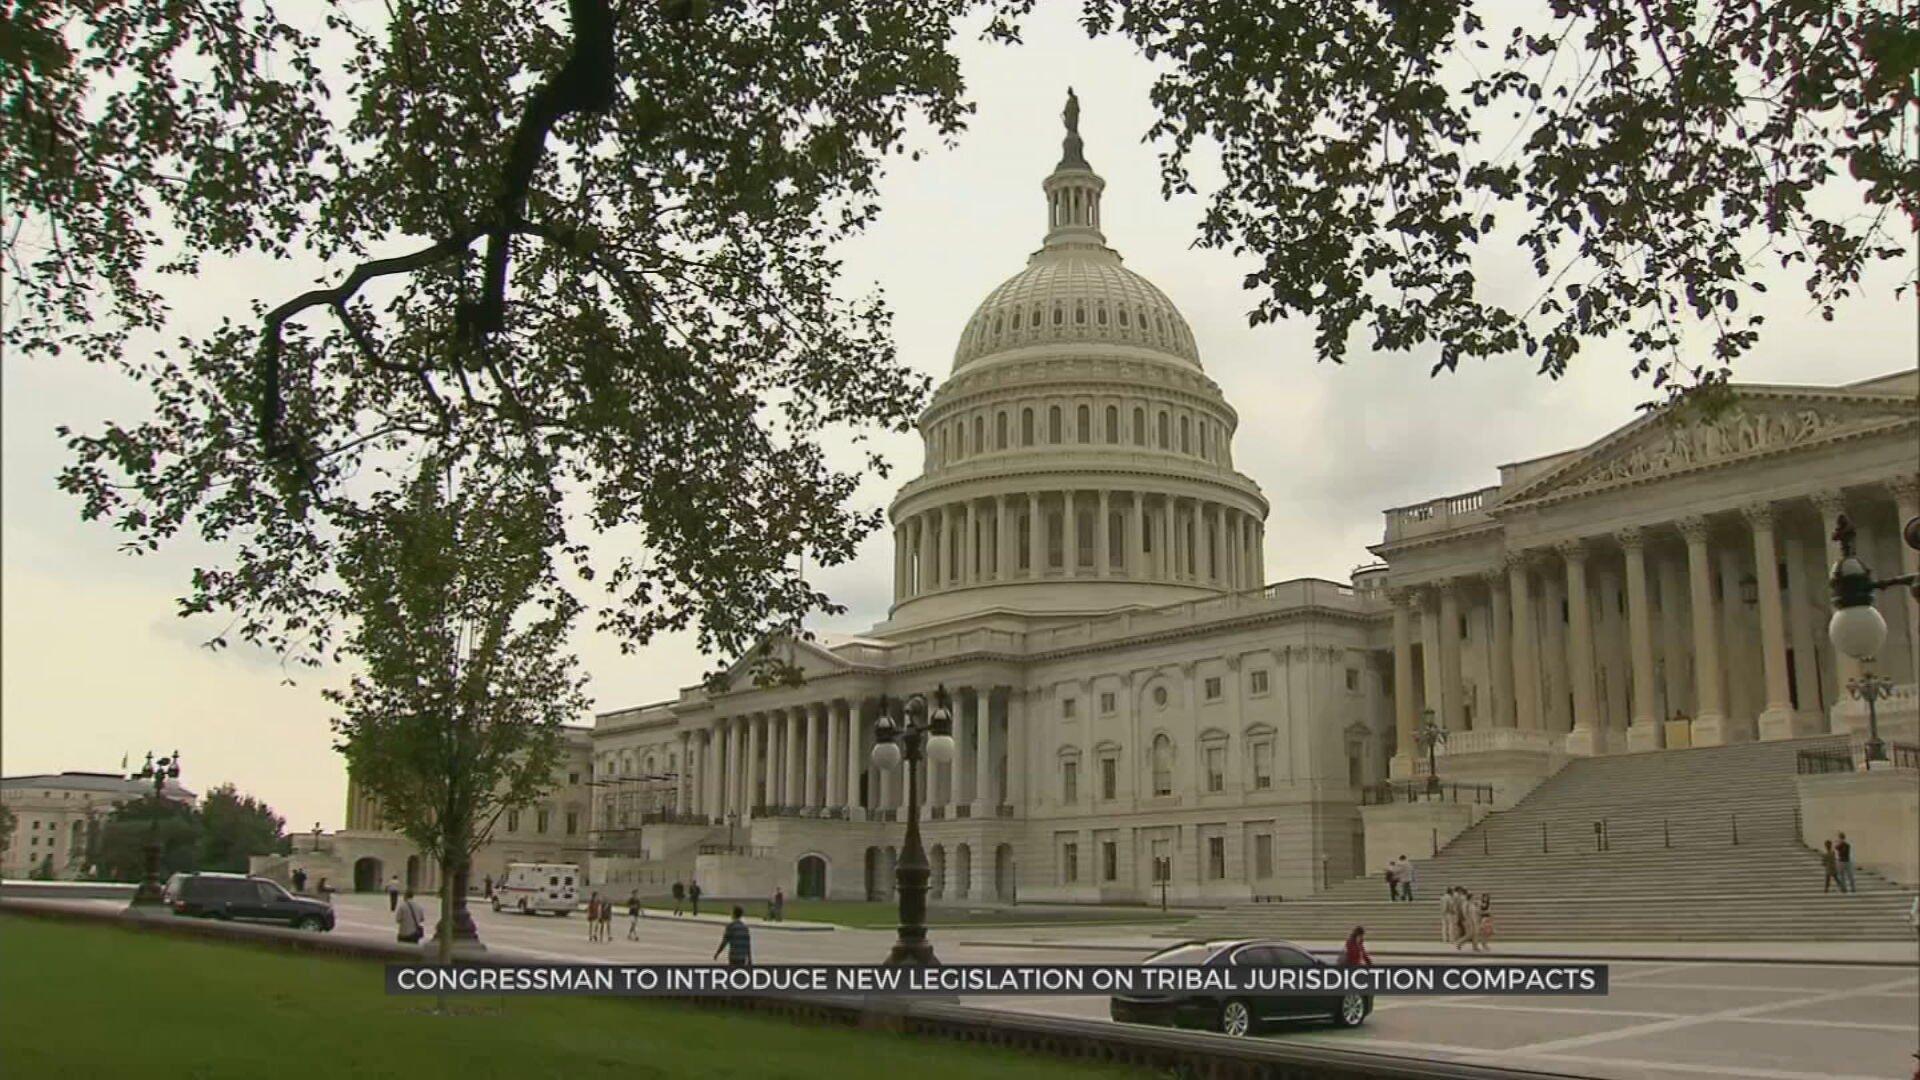 Oklahoma Congressman To Introduce Legislation On Tribal Jurisdiction Compacts